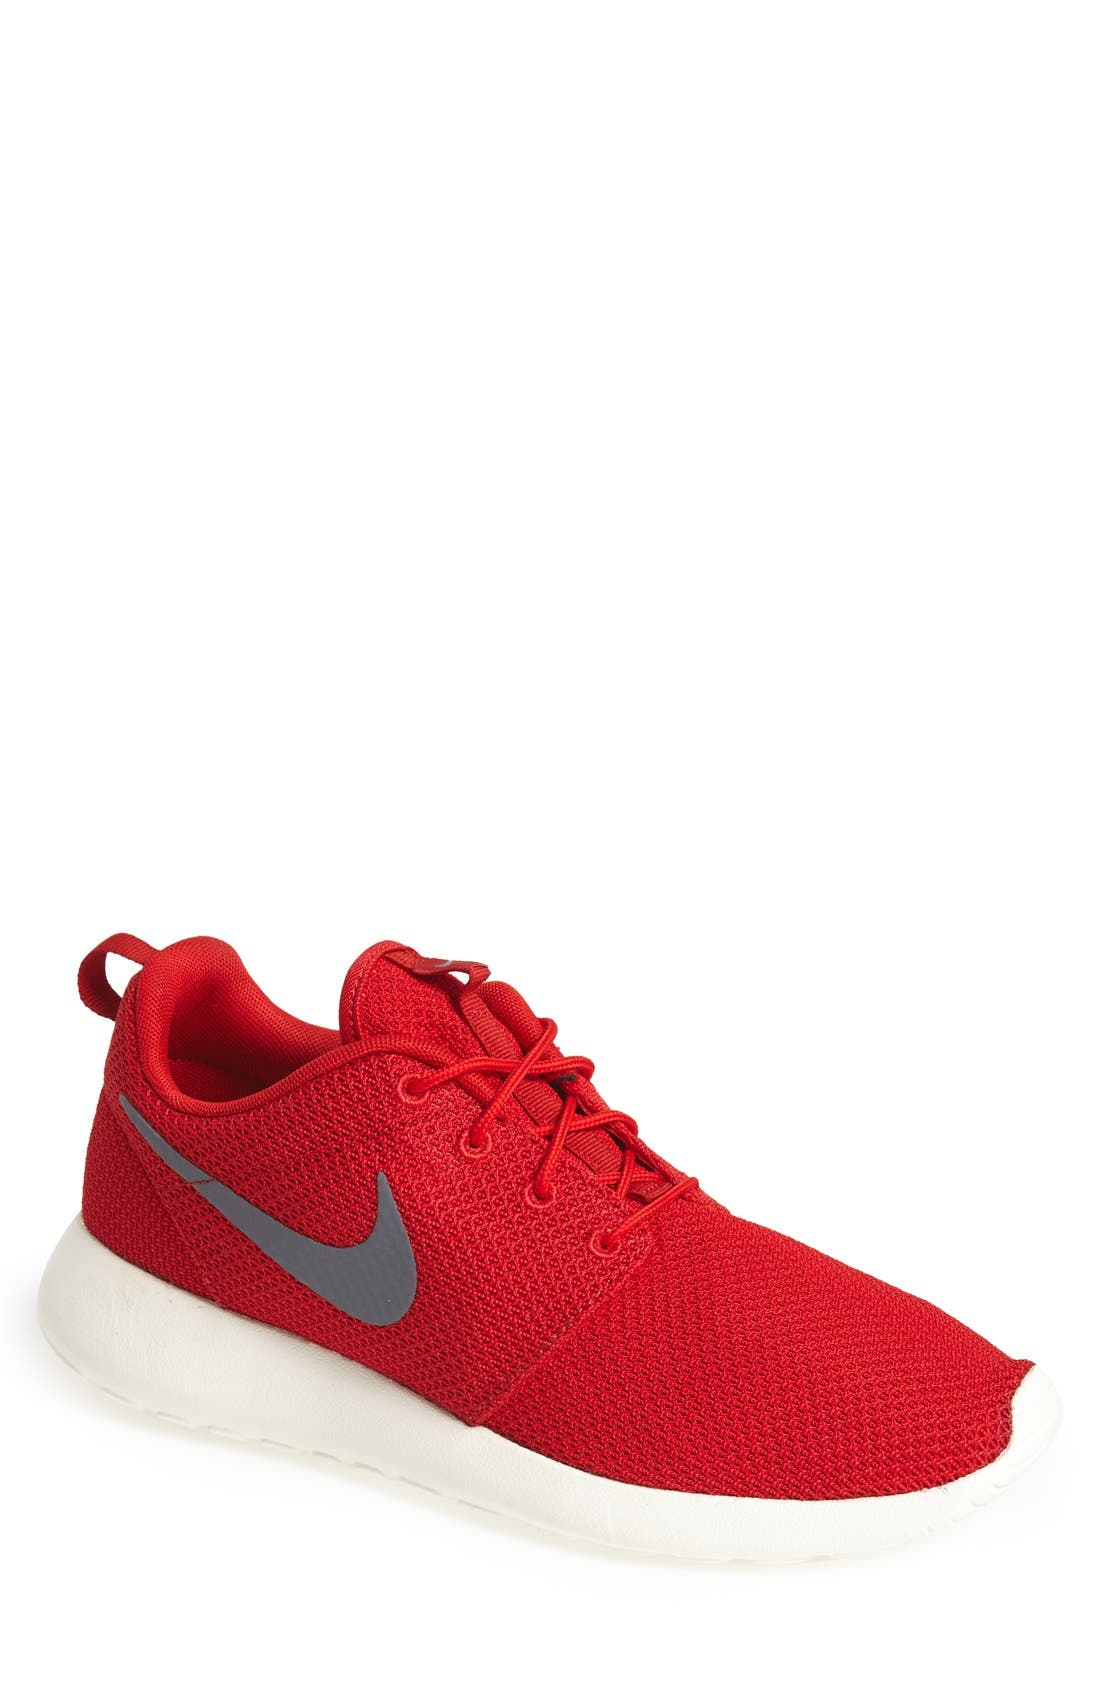 ,                             'Roshe Run' Sneaker,                             Main thumbnail 123, color,                             601